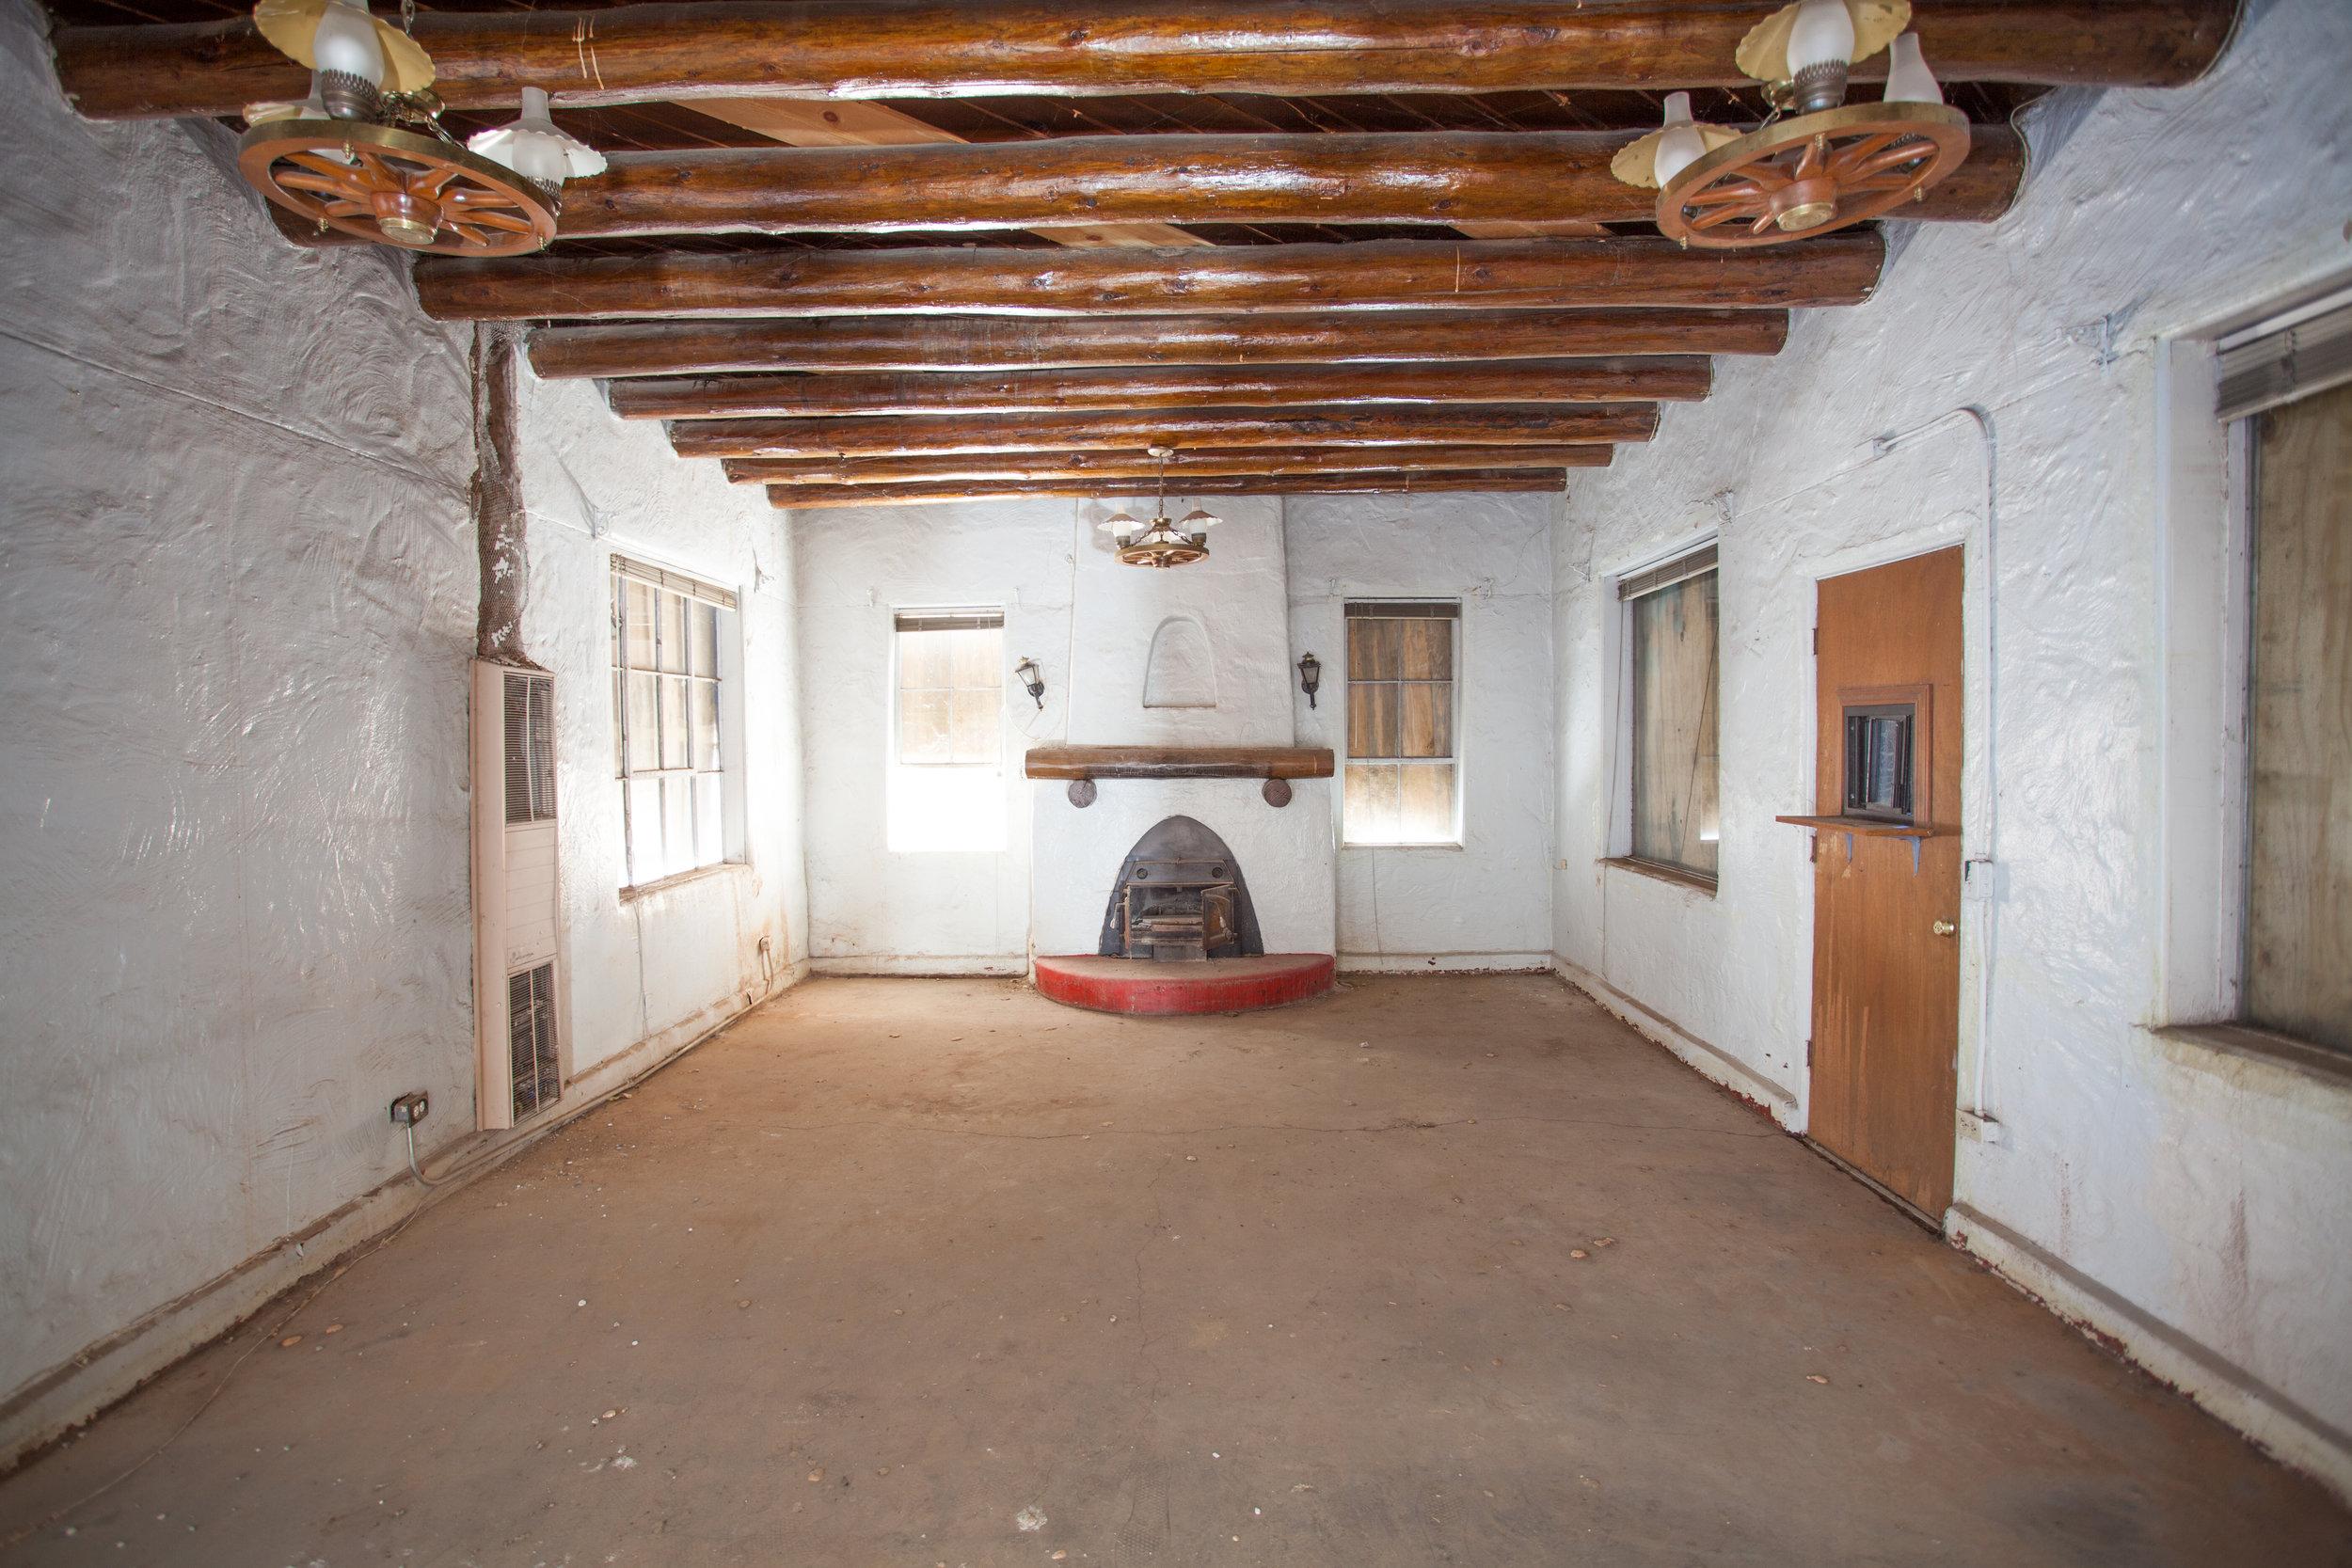 Hotel Kiva Fireplace Before Renovation